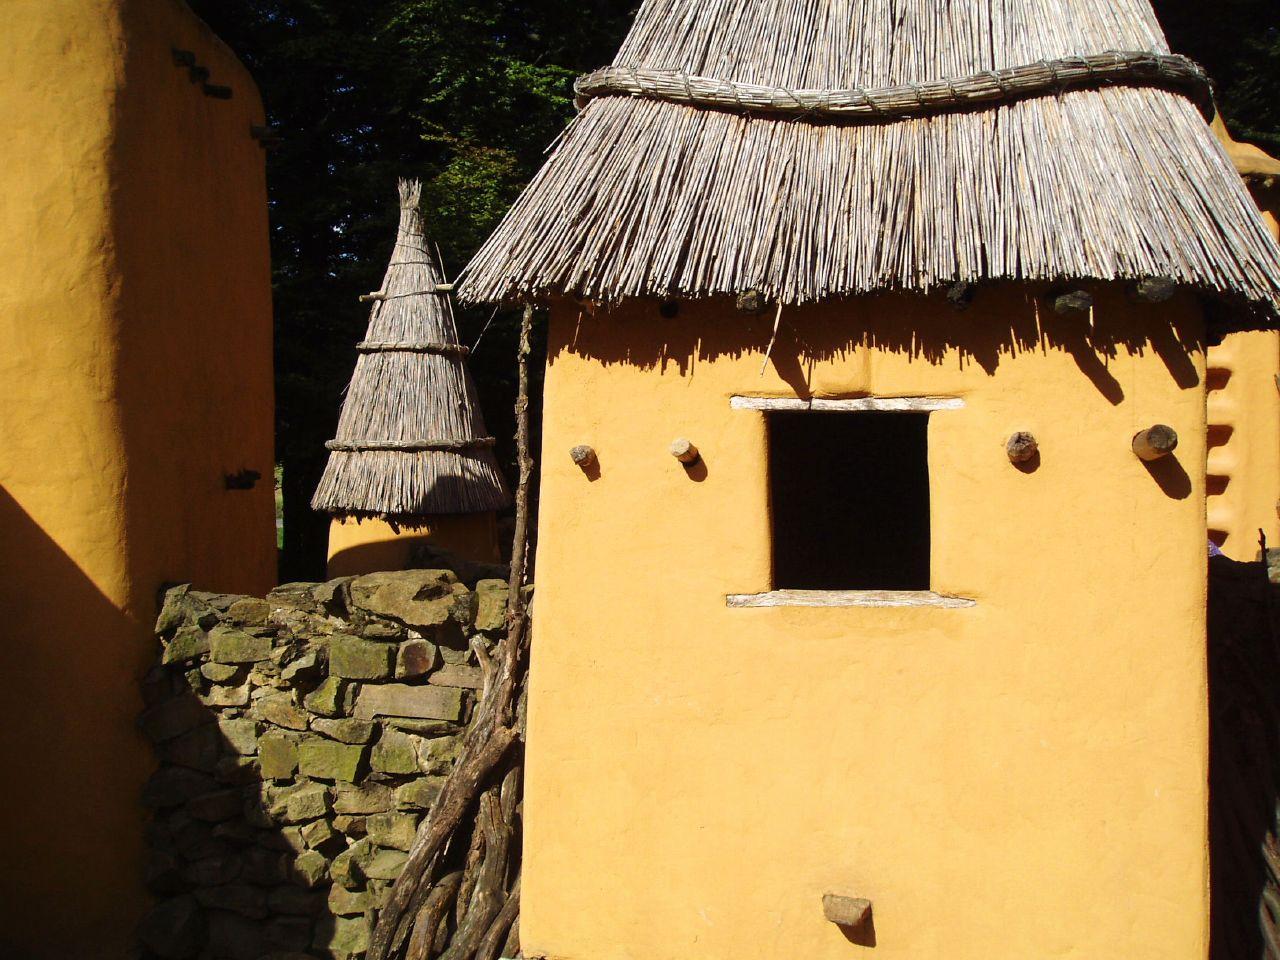 Mali_dogon_houses_josef_stuefer.jpg